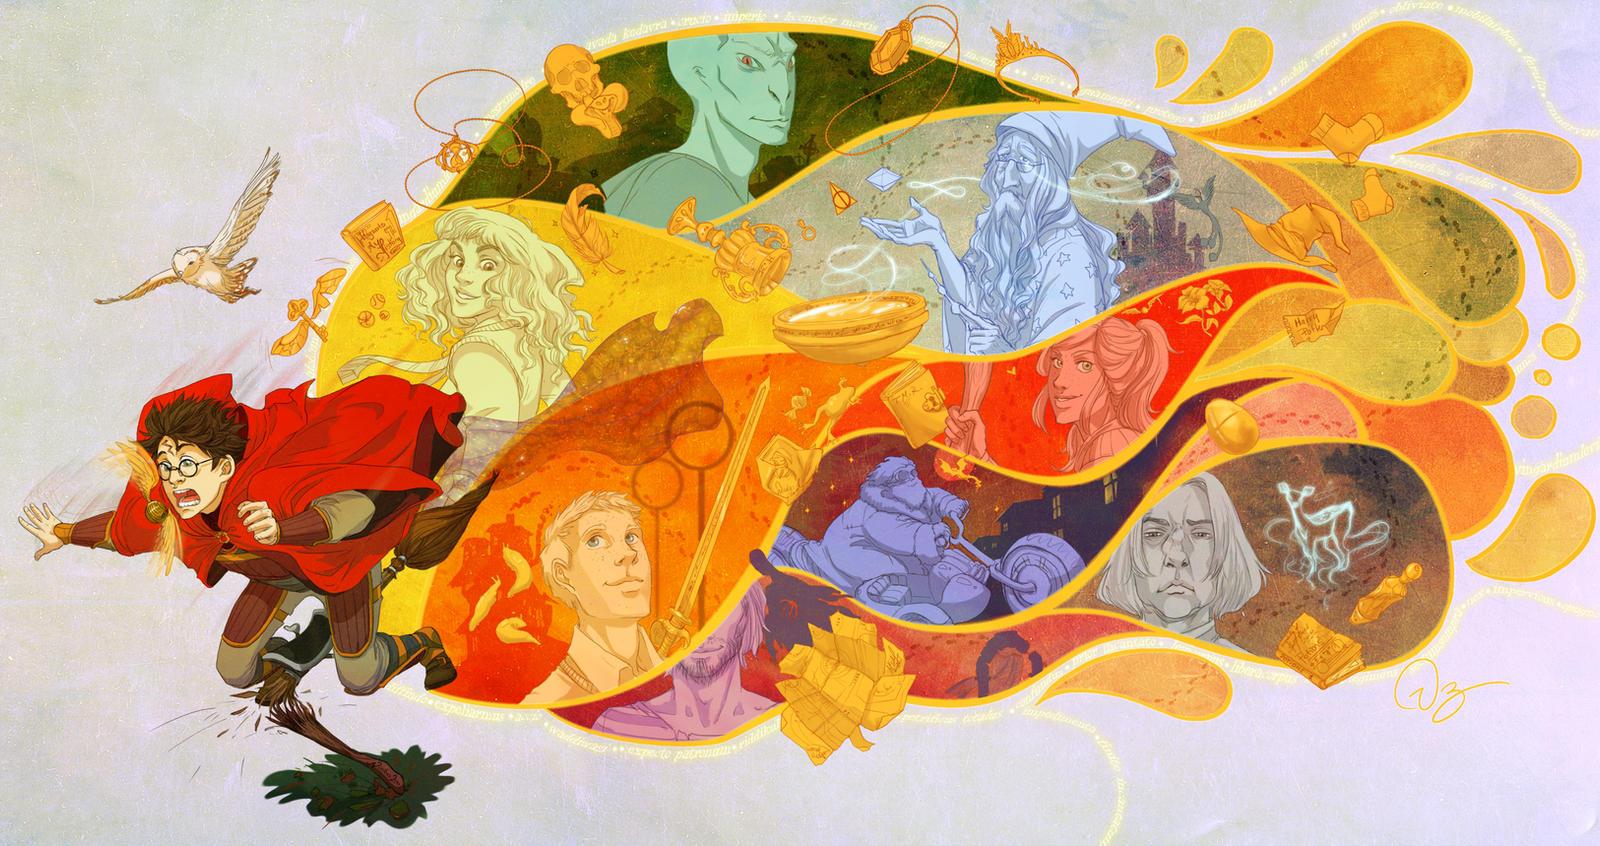 Good Wallpaper Harry Potter Fanart - harry_potter_years_by_palnk-d4yqvi6  HD_21393.jpg